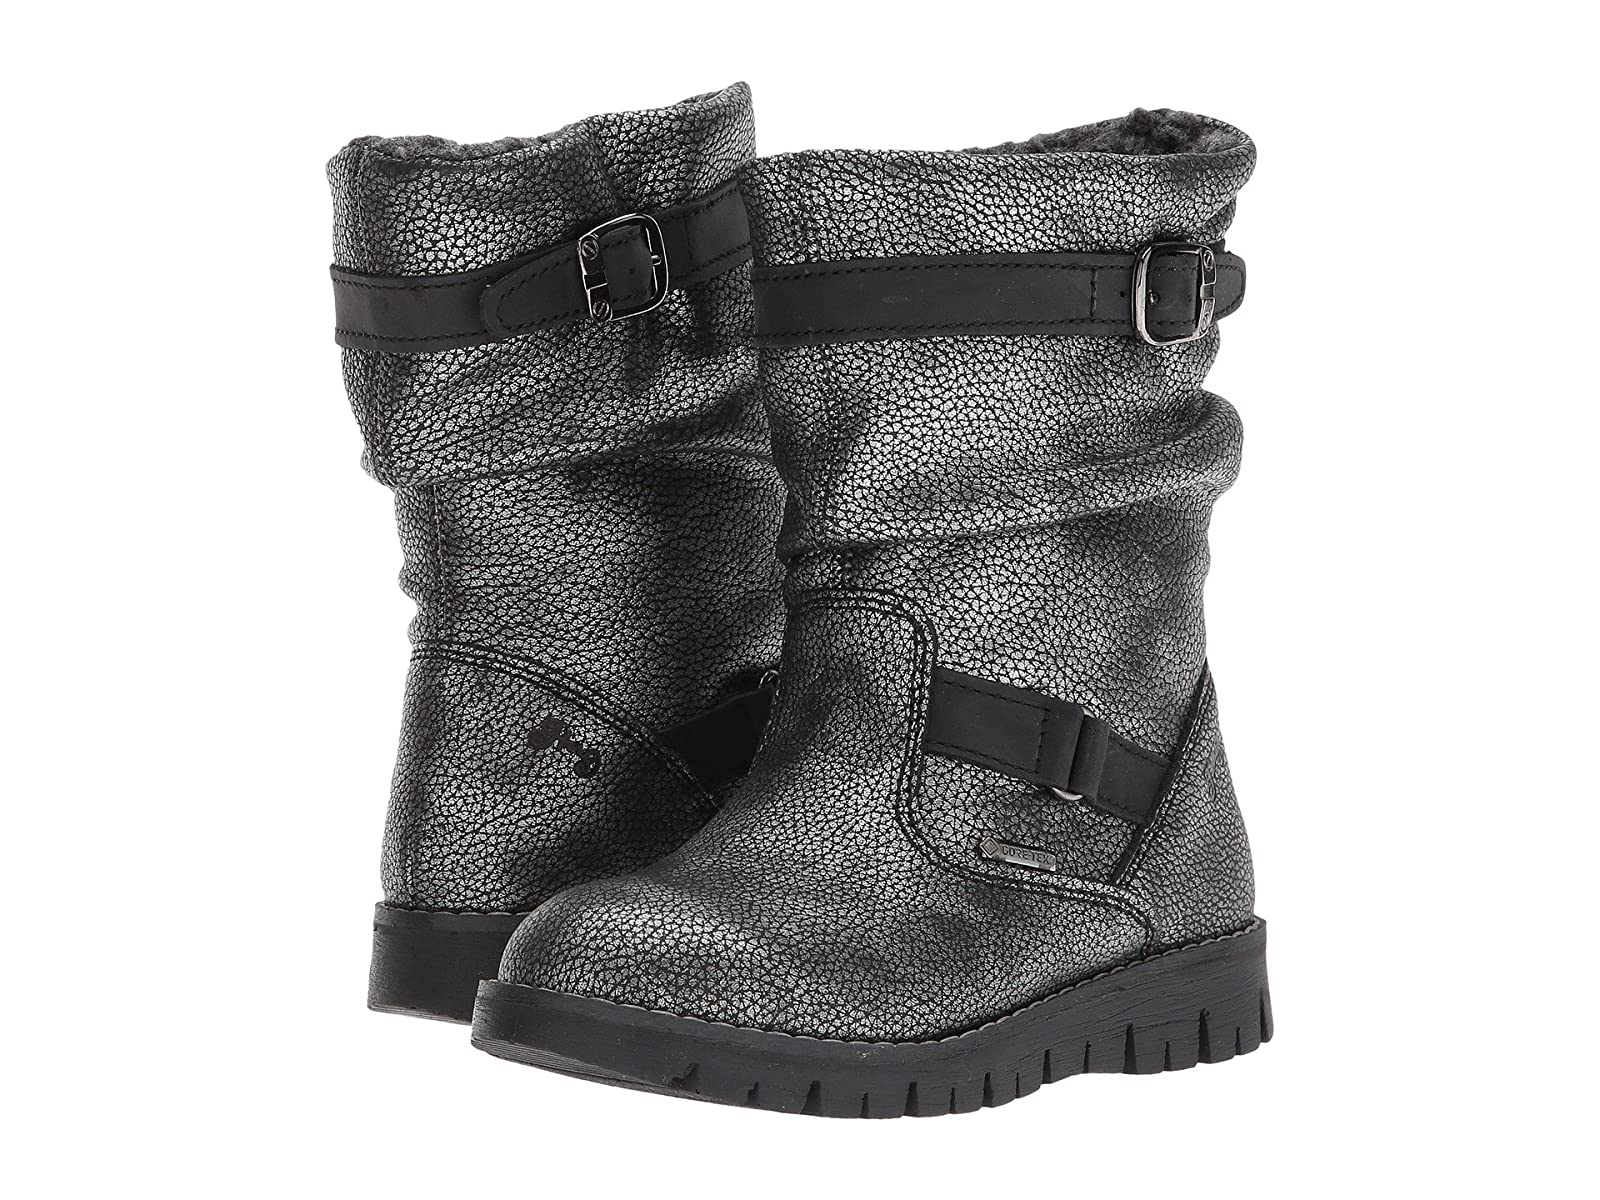 Primigi Kids PROGT 8599 (Toddler/Little Kid)Cheap and distinctive eye-catching shoes